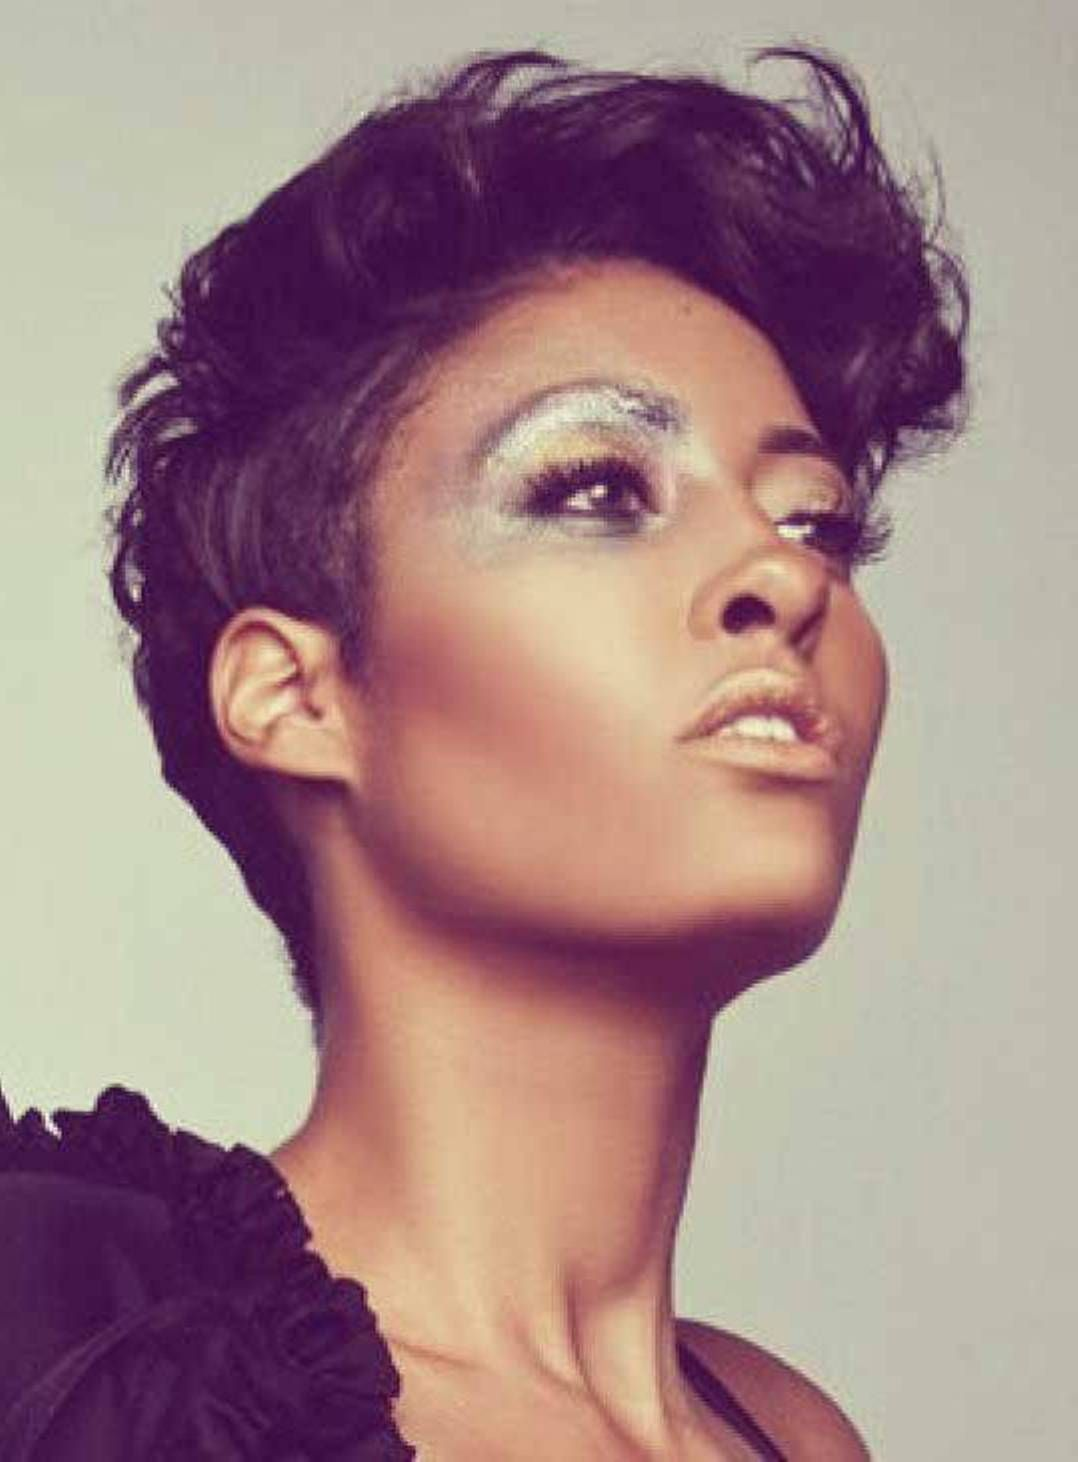 Marvelous African American Hairstyles Short Hair Short Hairstyles For Hairstyles For Men Maxibearus